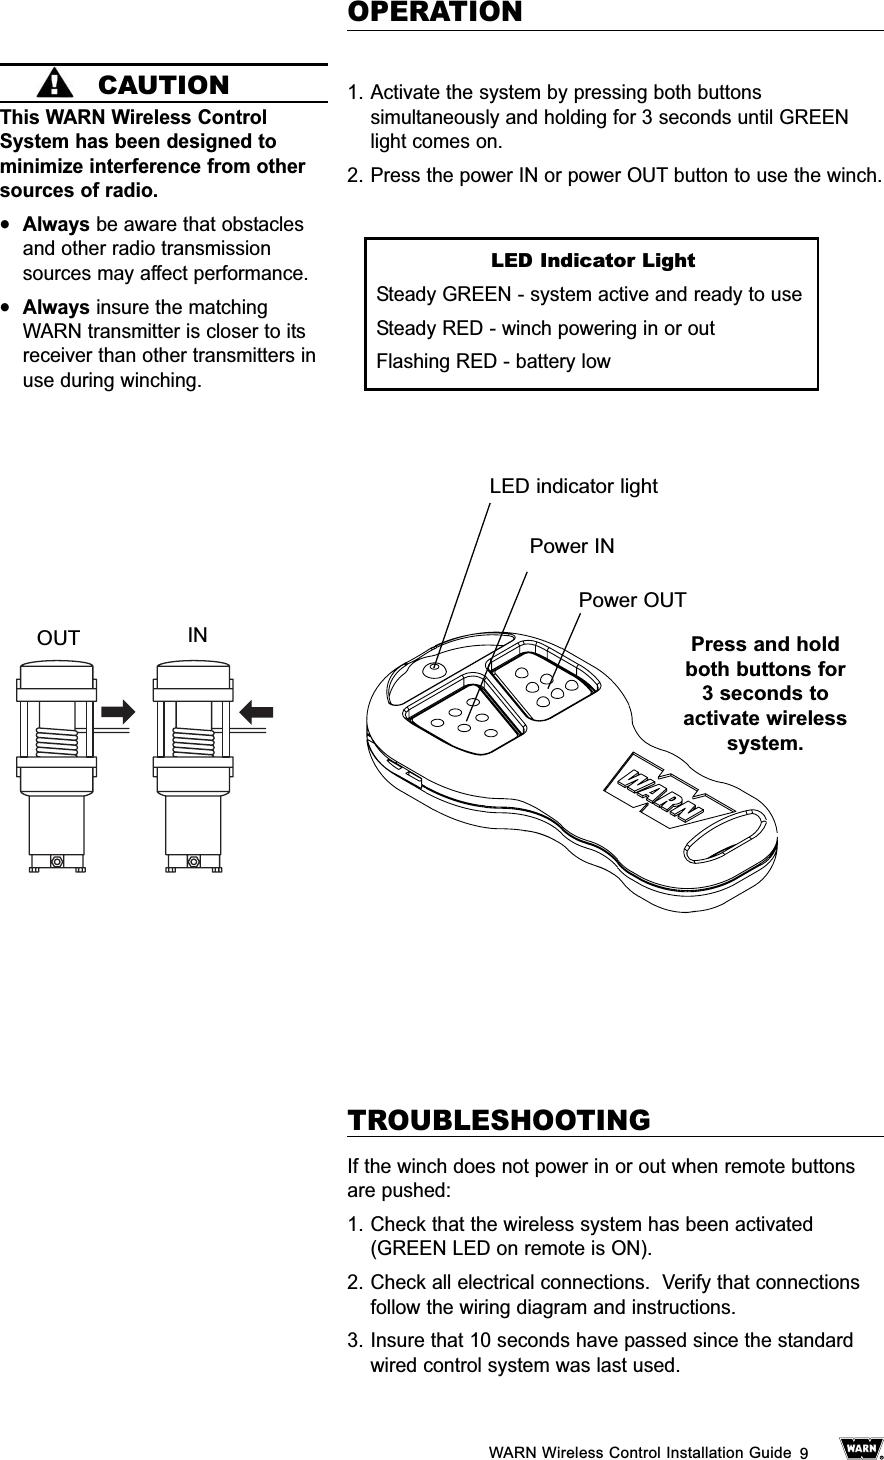 Warn Wireles Control Diagram